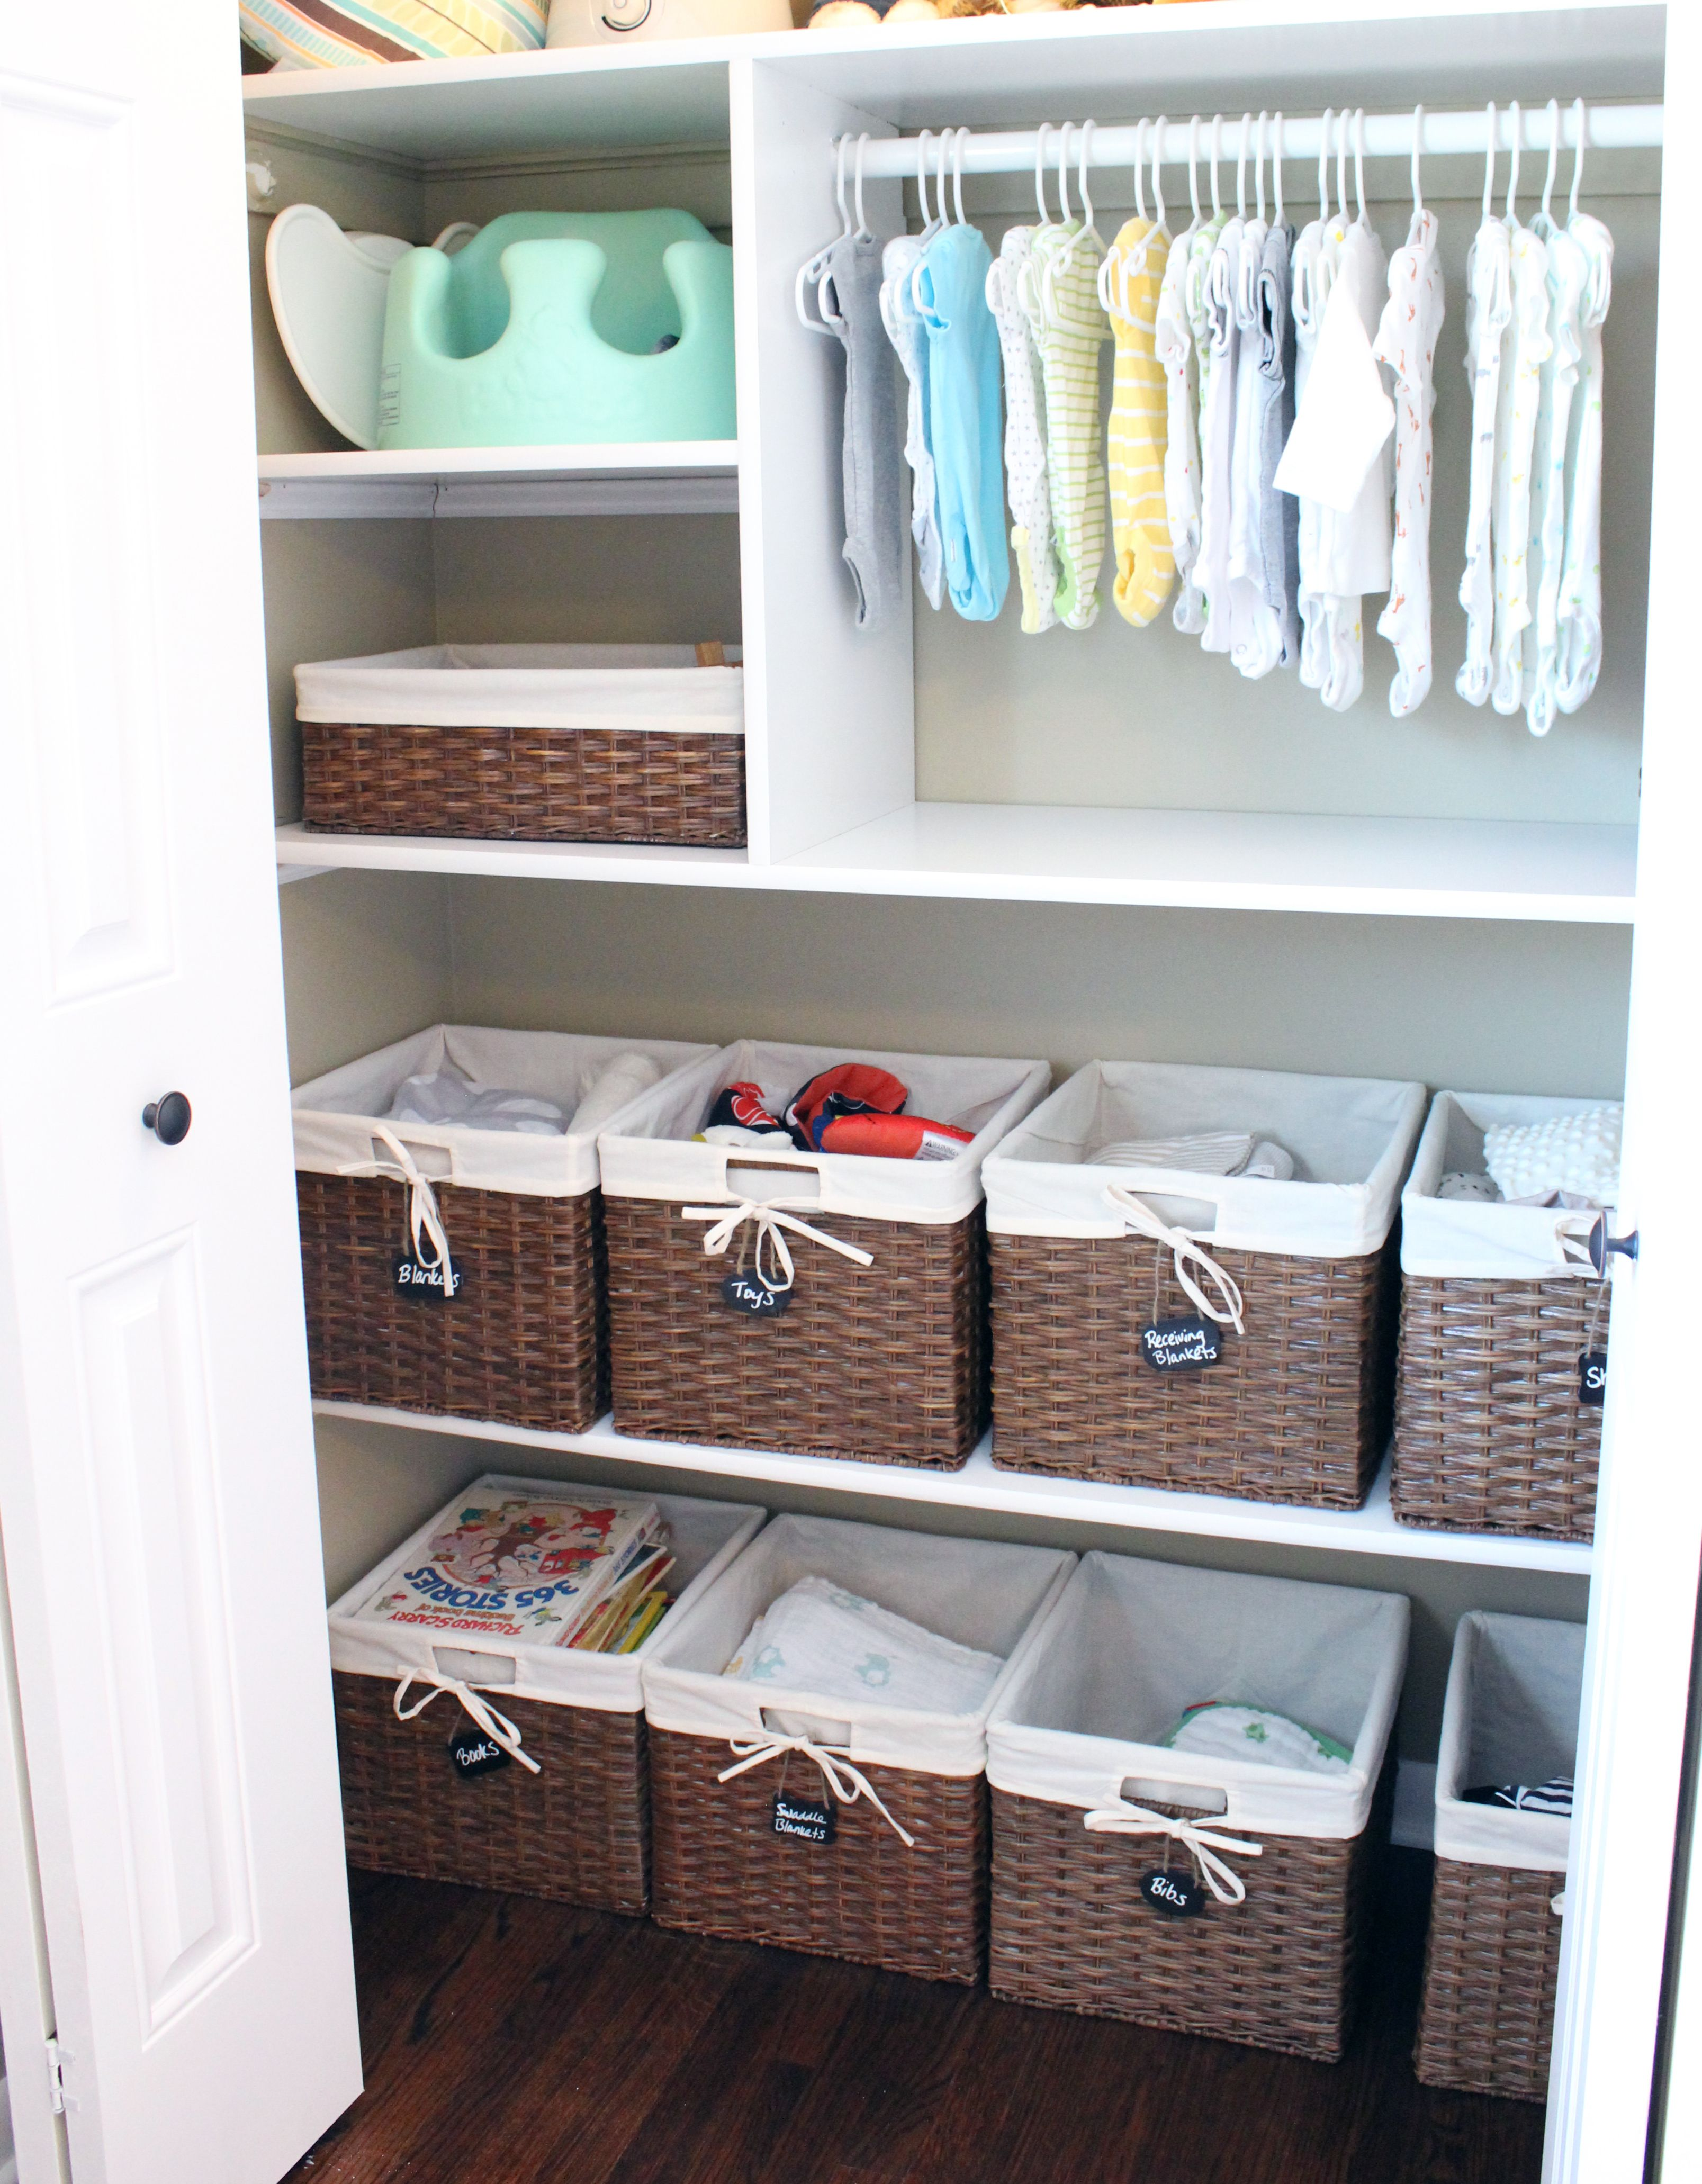 Nursery Closet Organization | Pinterest Baby | Pinterest ...